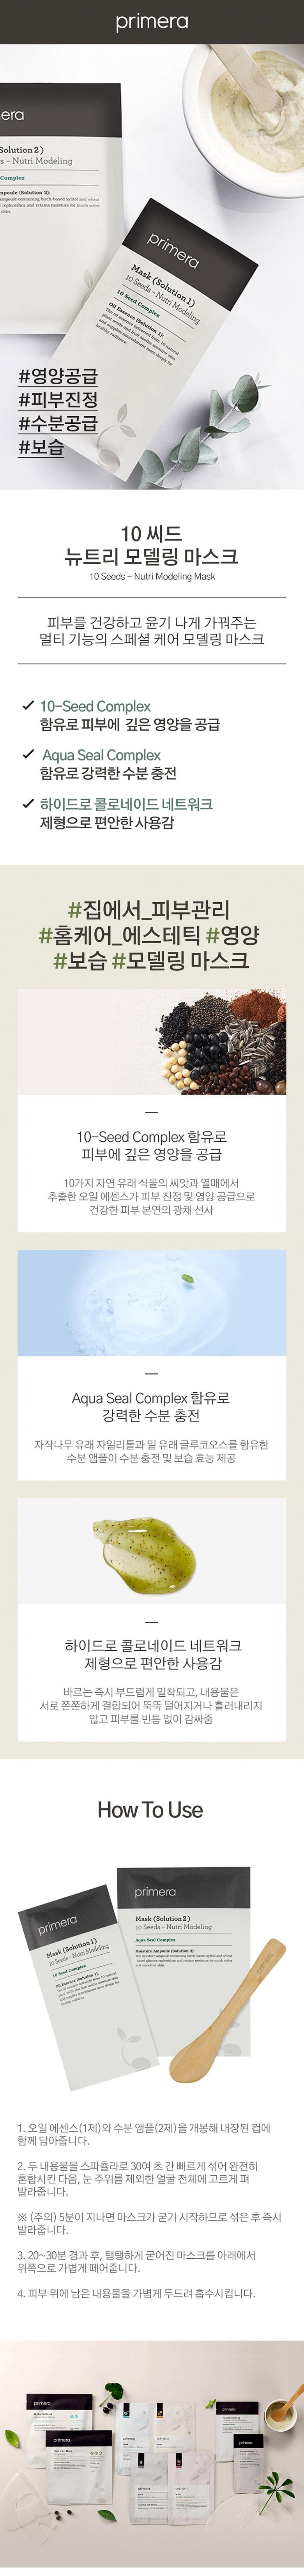 primera 10 Seeds Nutri Modeling Mask korean skincare product online shop malaysia macau poland1